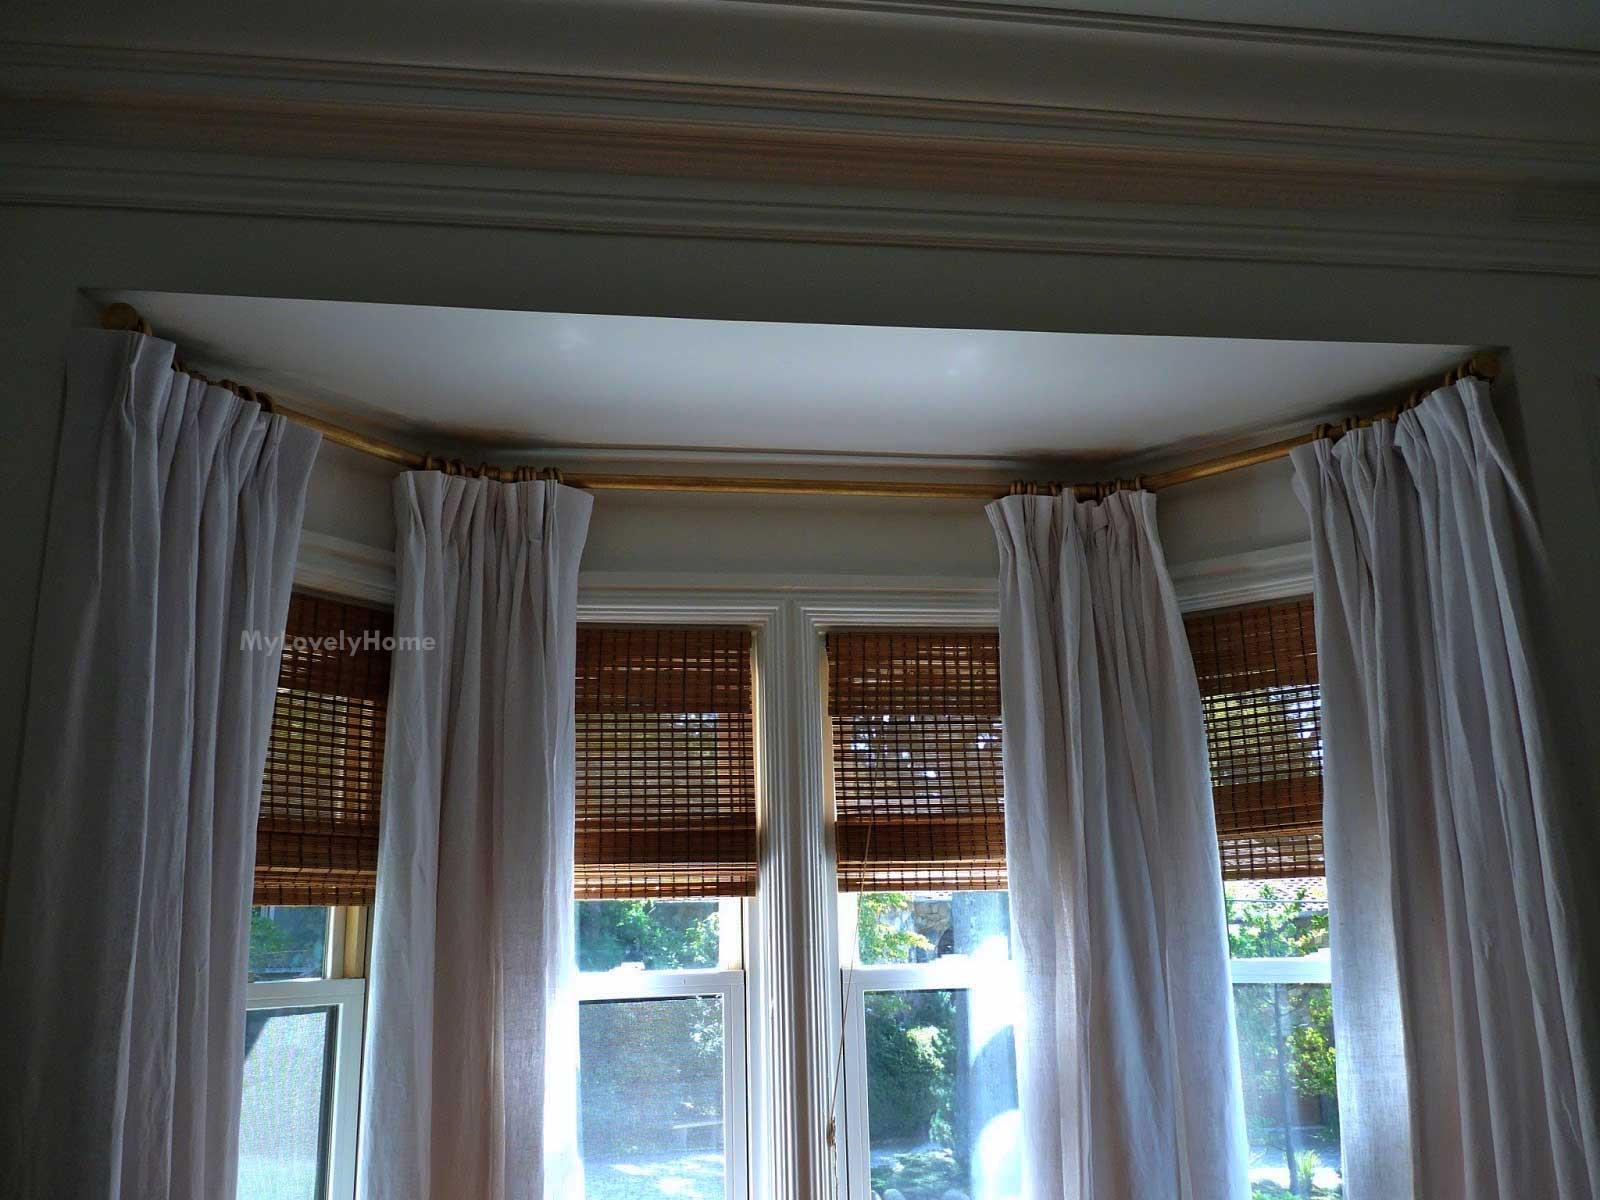 window bay curtain pole instalation tips